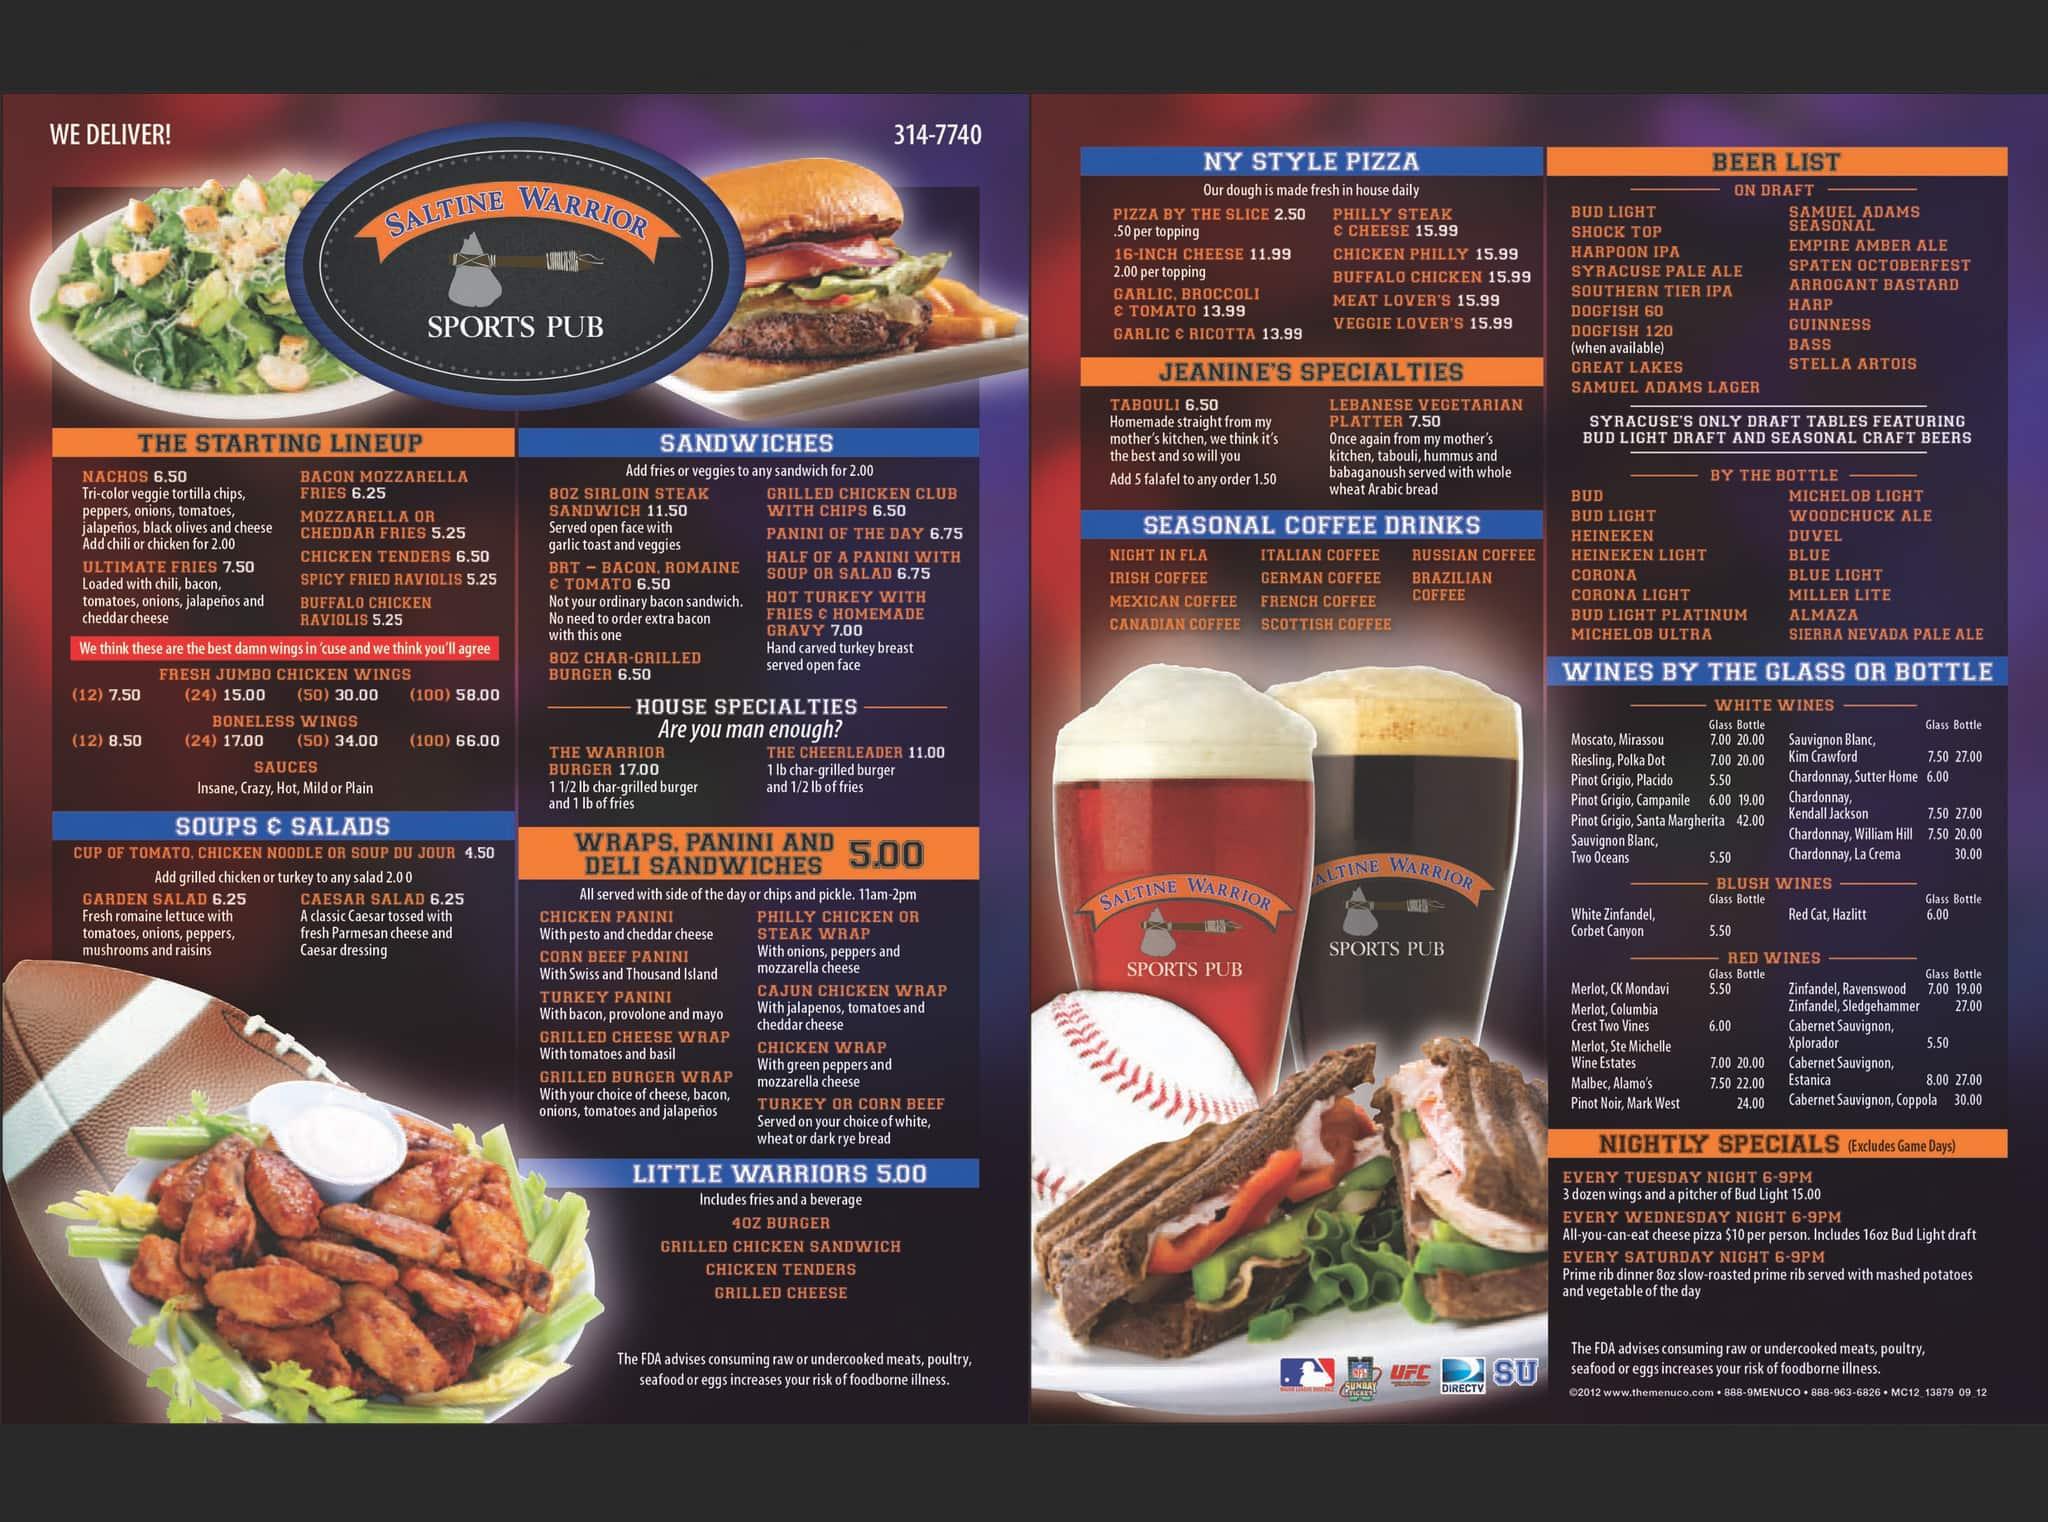 Saltine warrior sports pub menu urbanspoon zomato for The food bar zomato